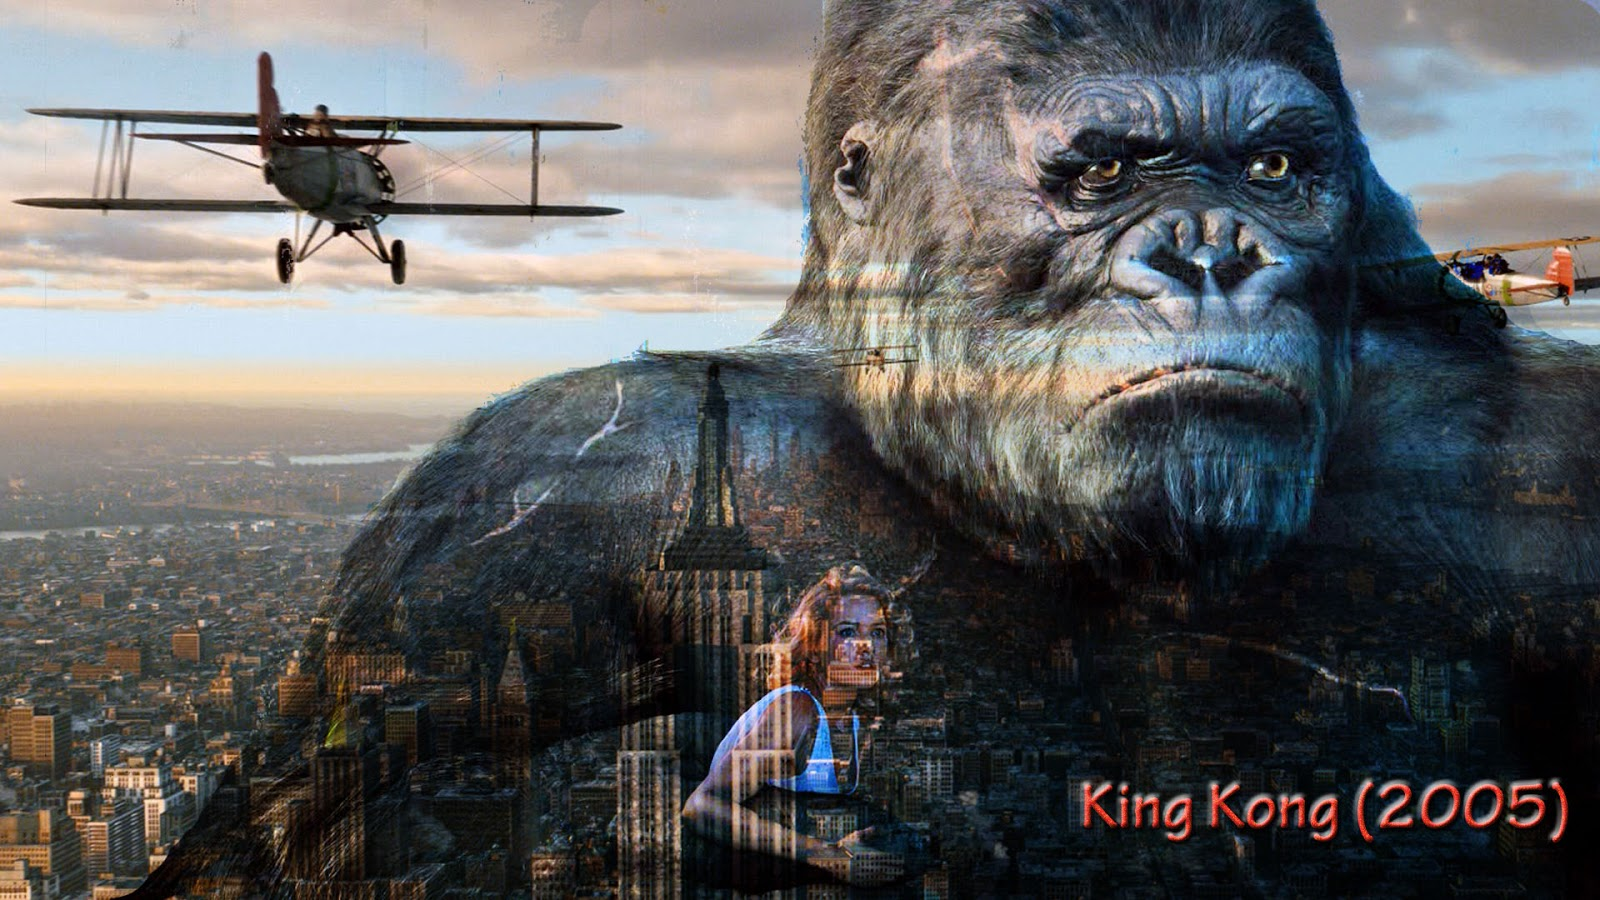 King Kong 2005 Full Movie In Hindi Free Download